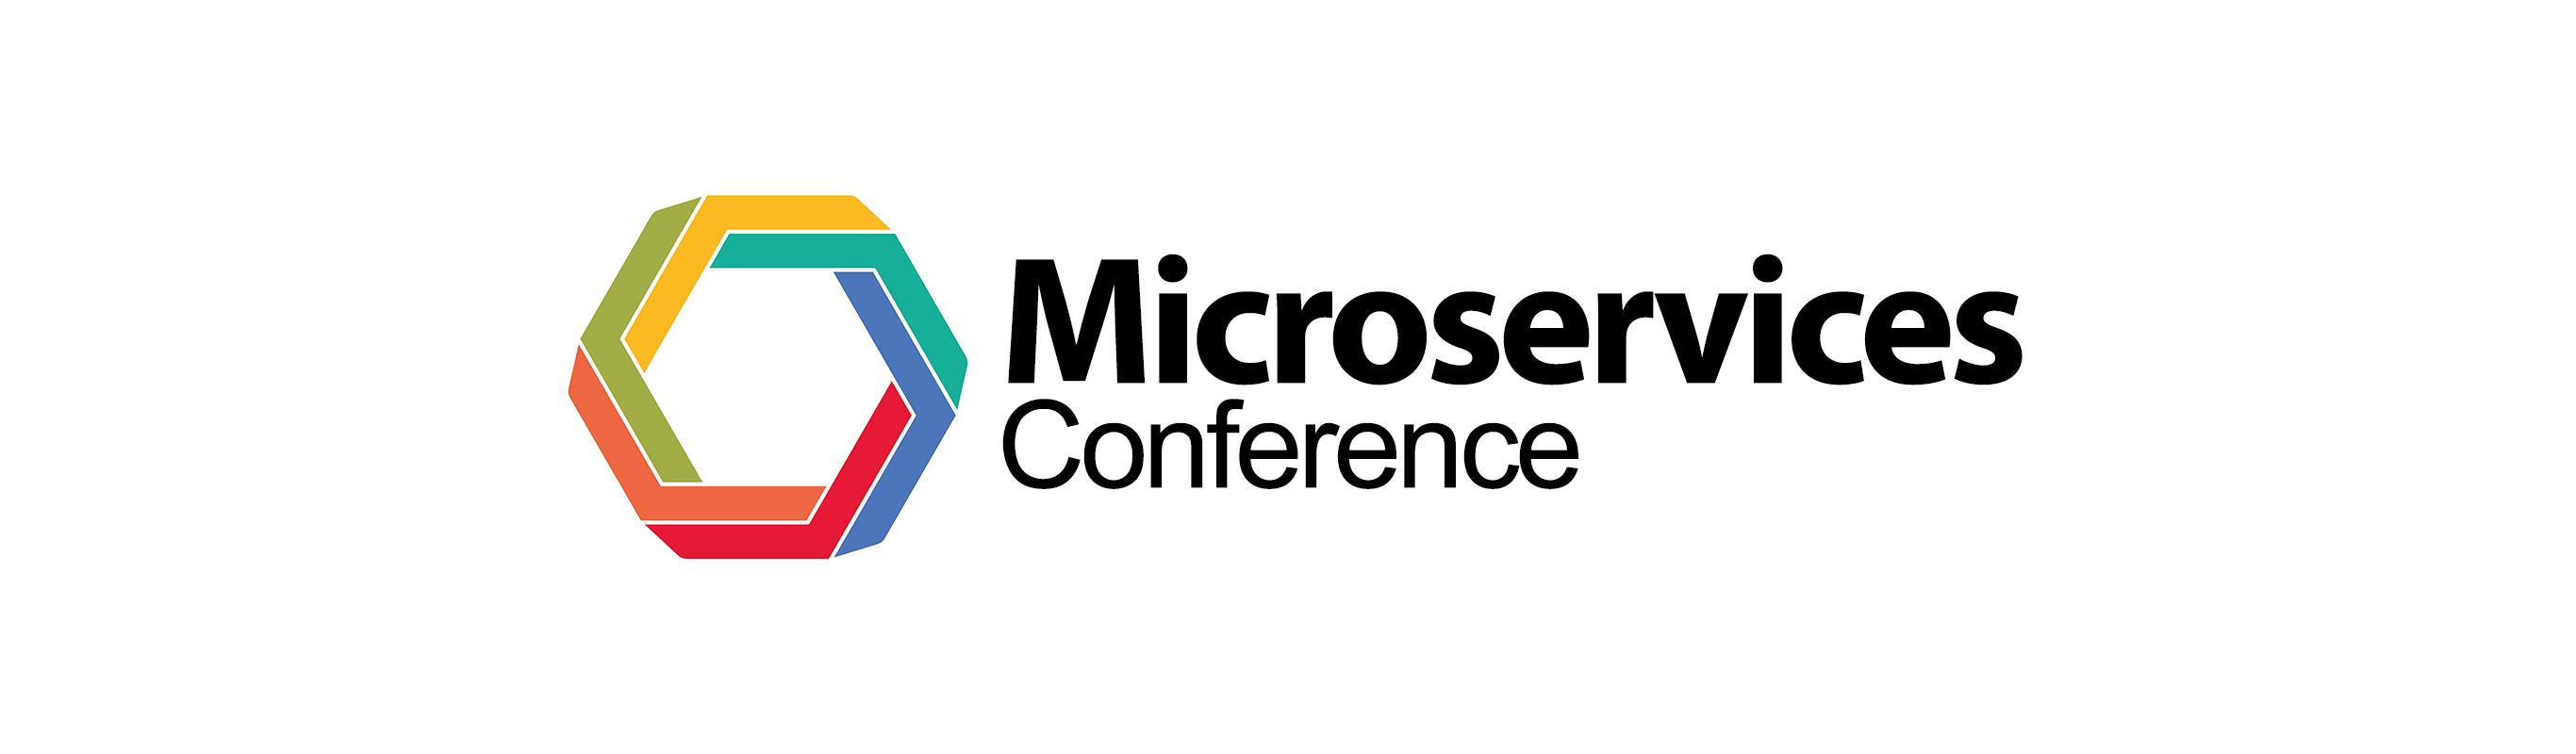 https://conf-micro.services